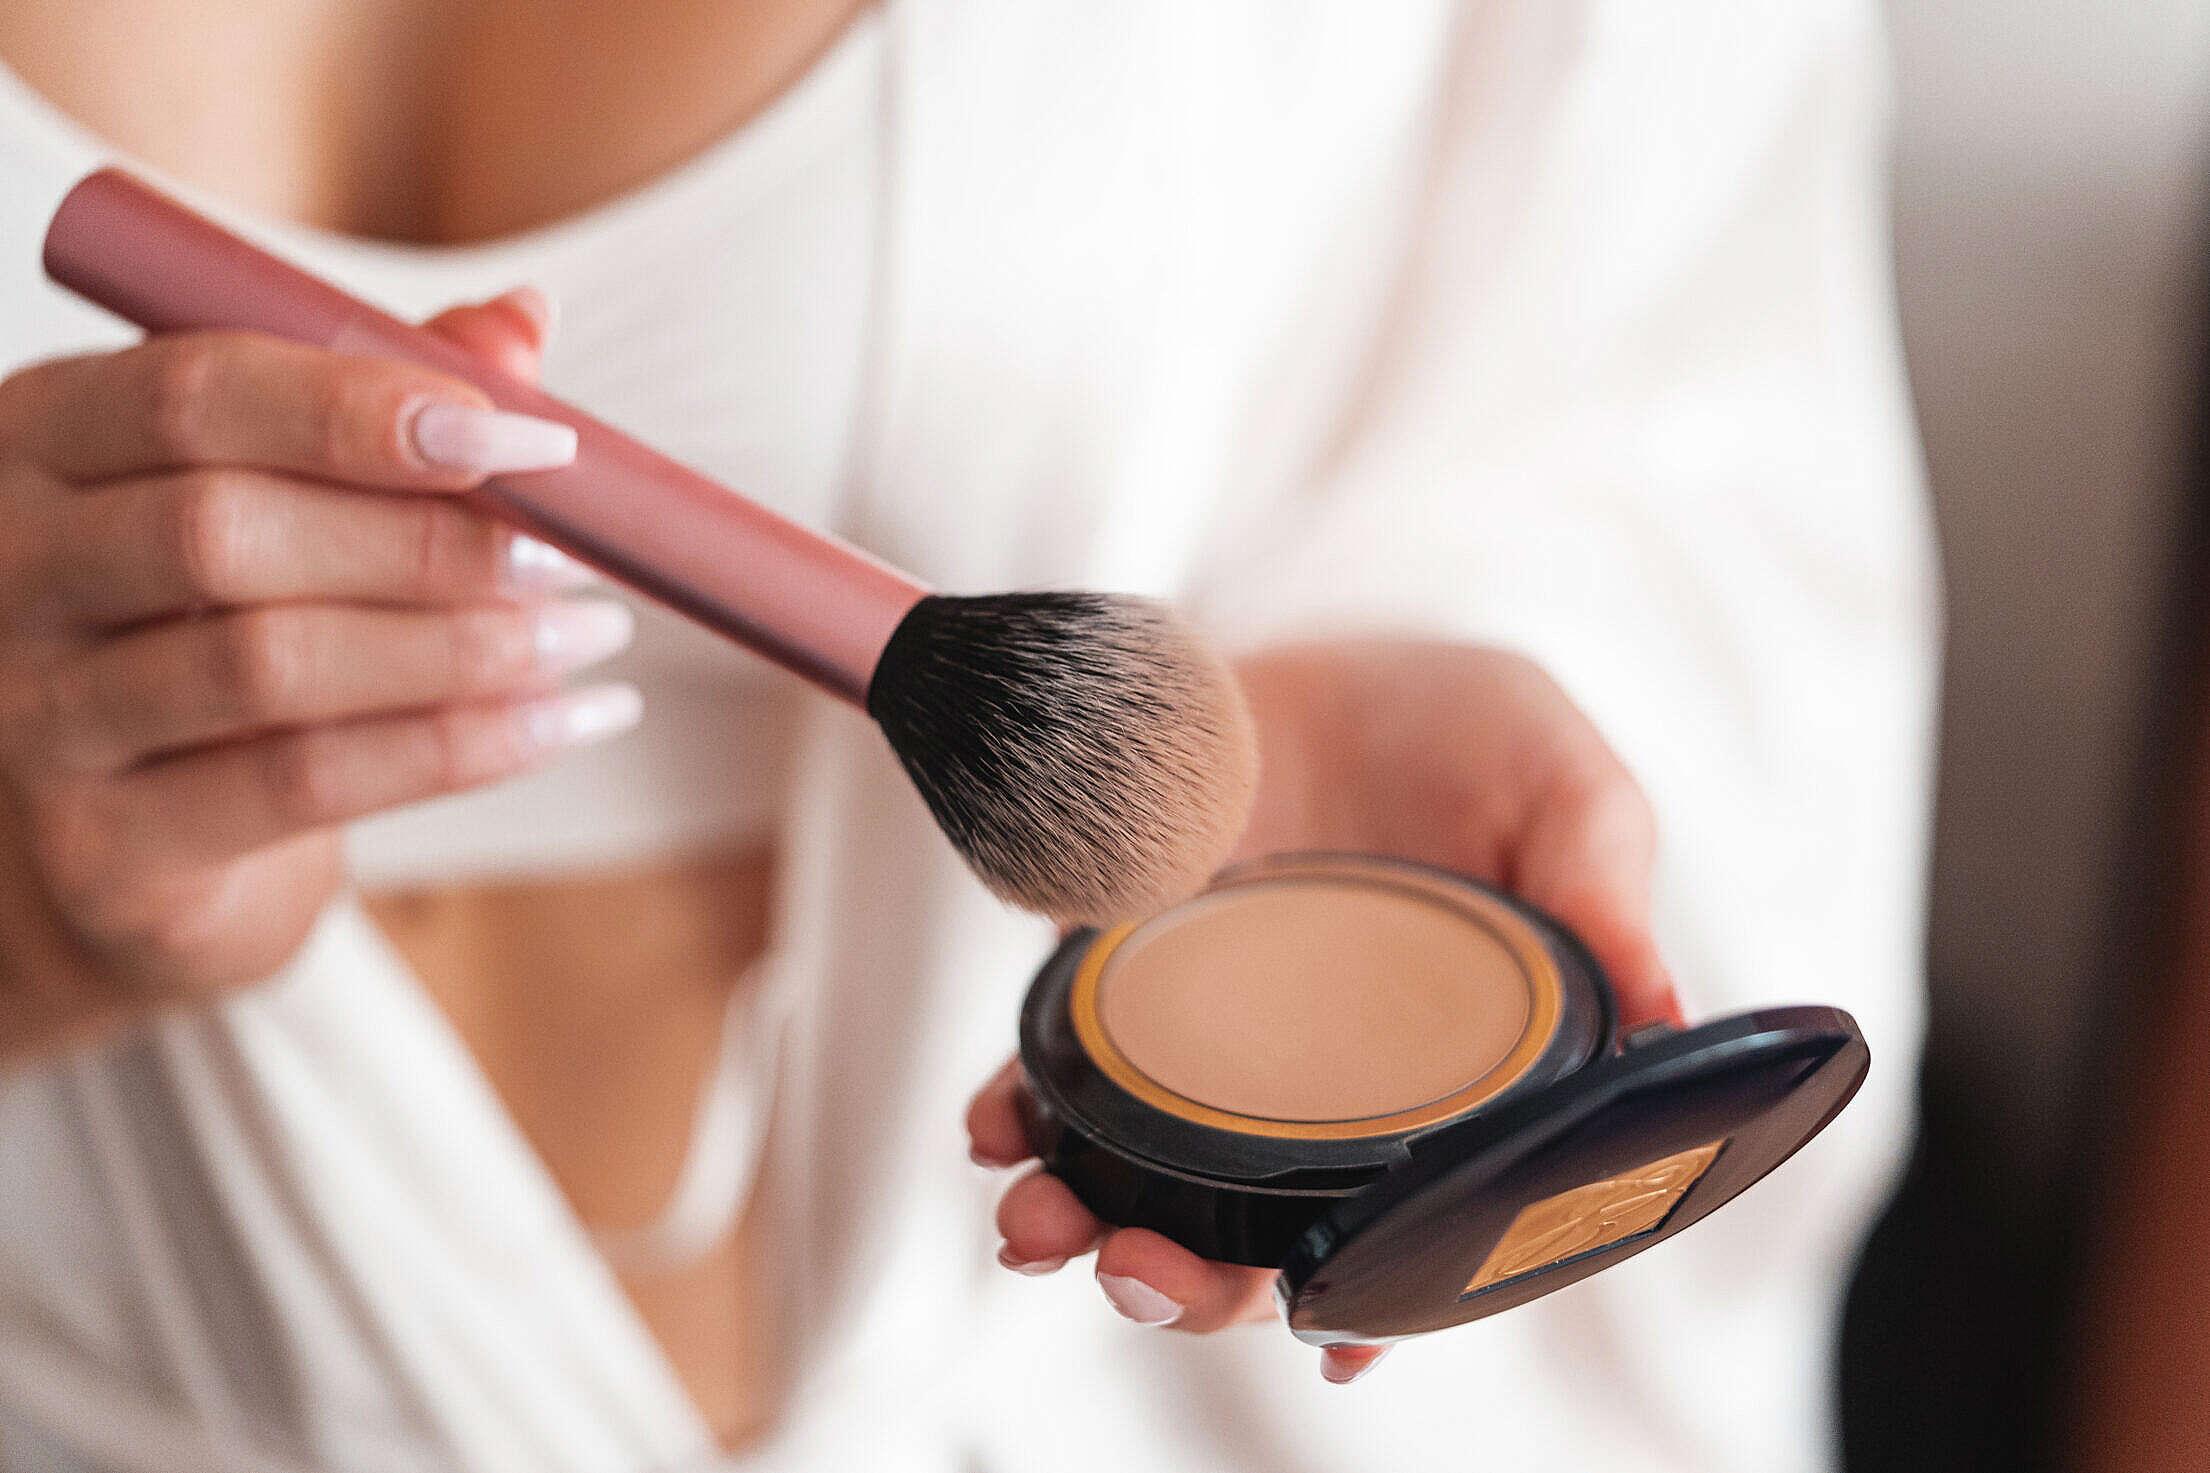 Woman Using Make Up Powder Brush Free Stock Photo